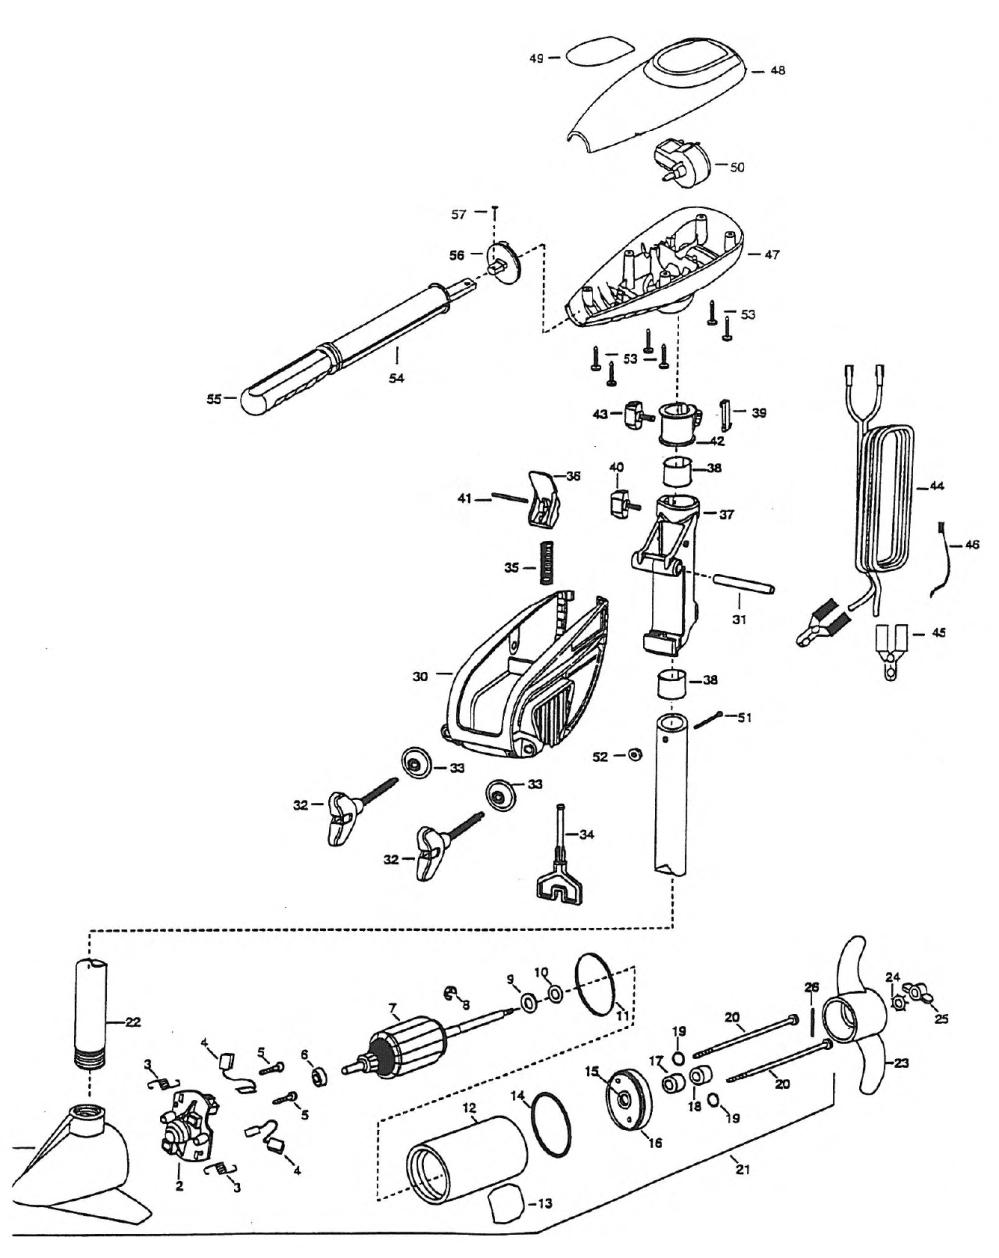 medium resolution of minn kota powermax 52 parts 1998 from fish307 comminn kota motor parts wiring diagrams 13